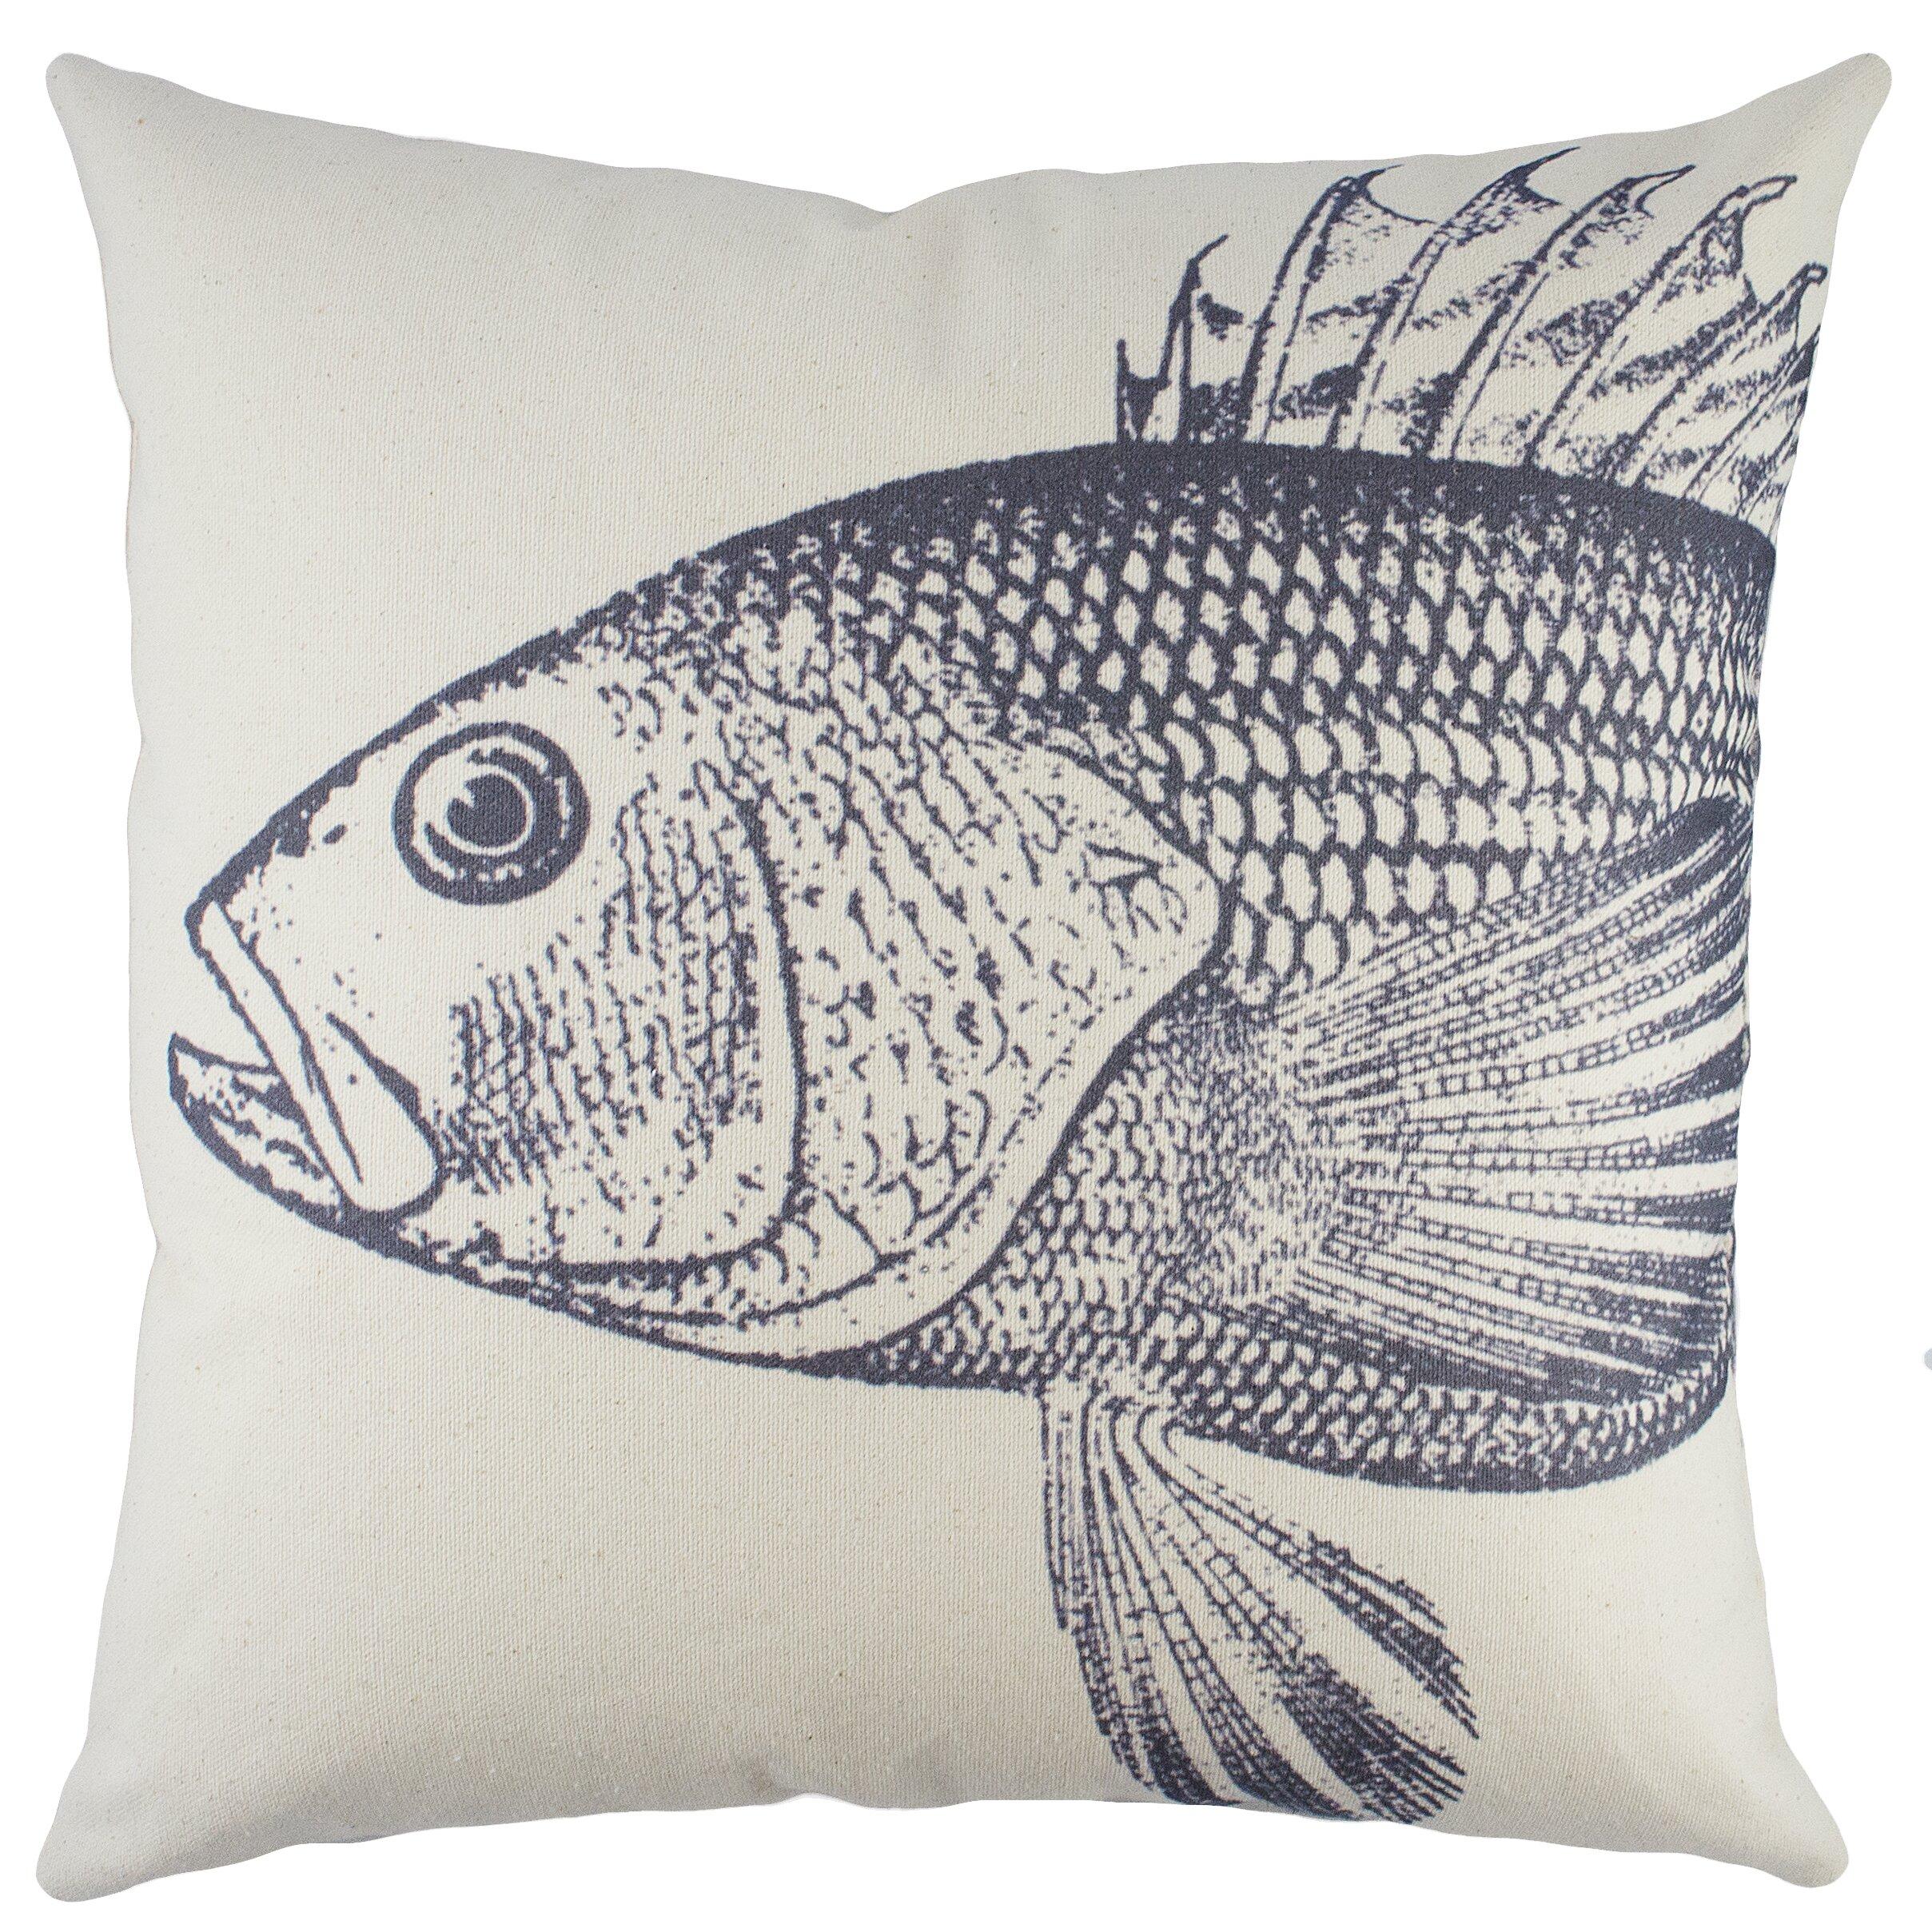 Thewatsonshop fish cotton throw pillow reviews wayfair for Fish throw pillows